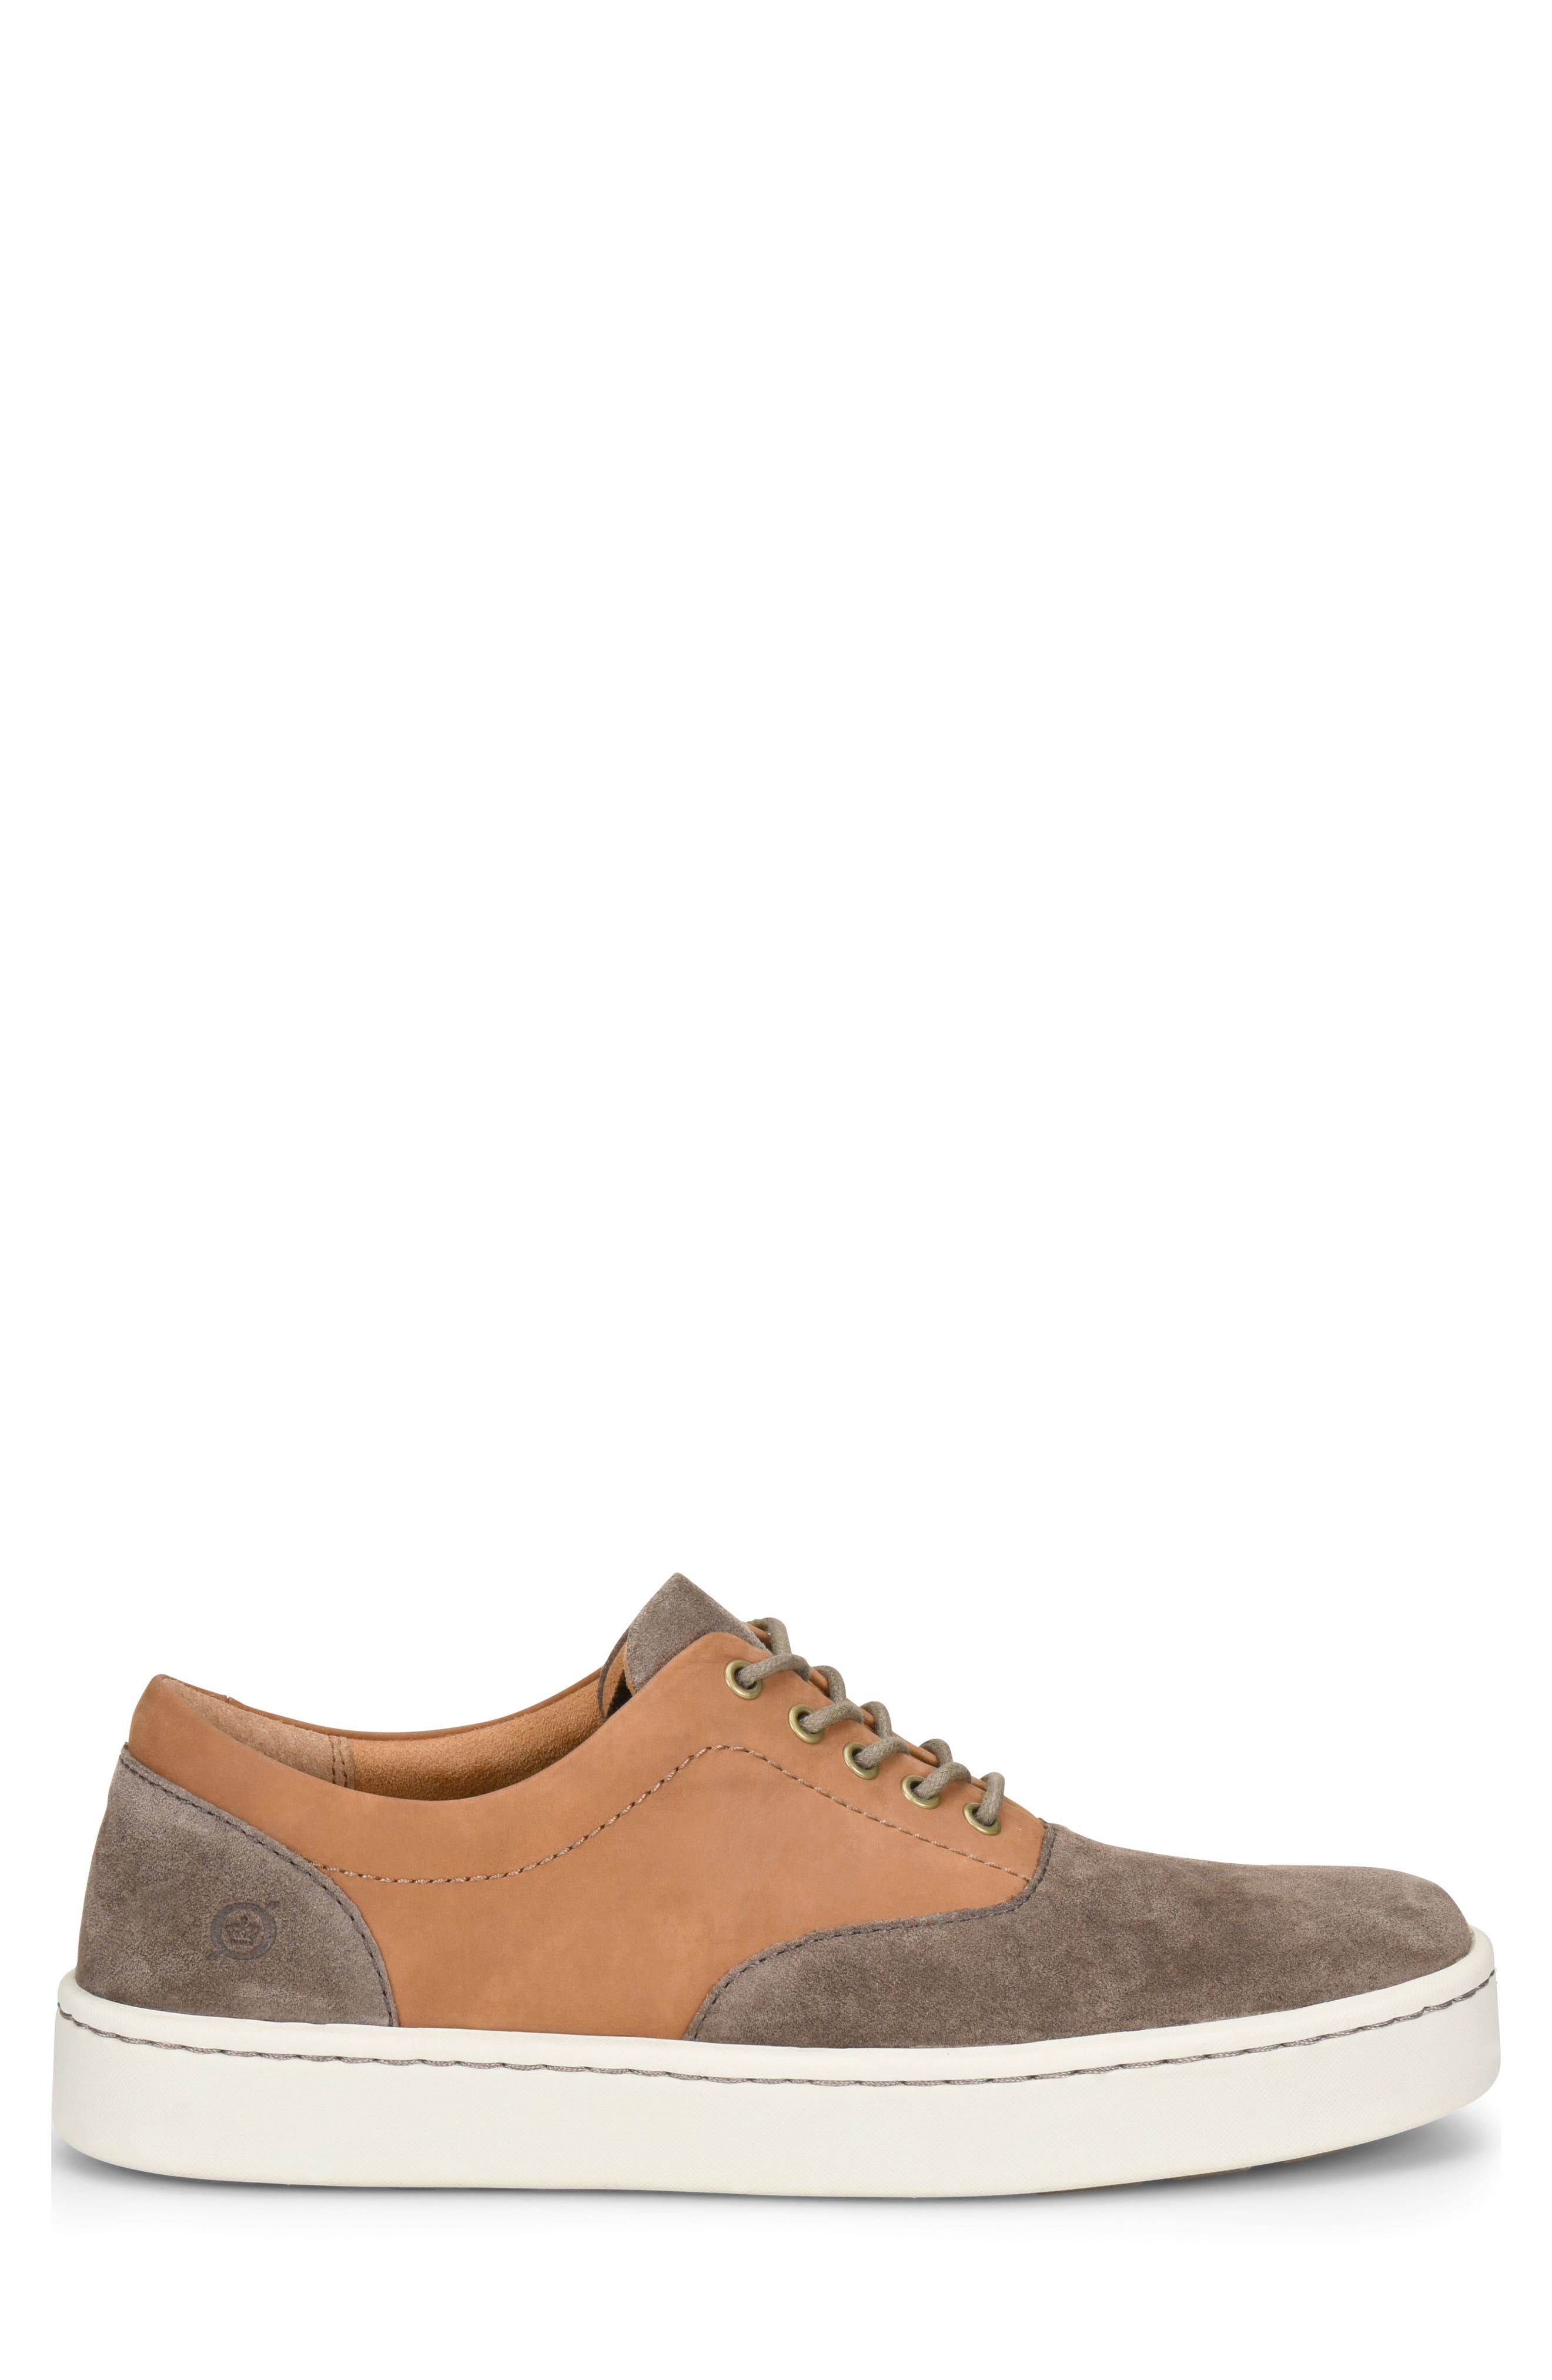 Keystone Low Top Sneaker,                             Alternate thumbnail 8, color,